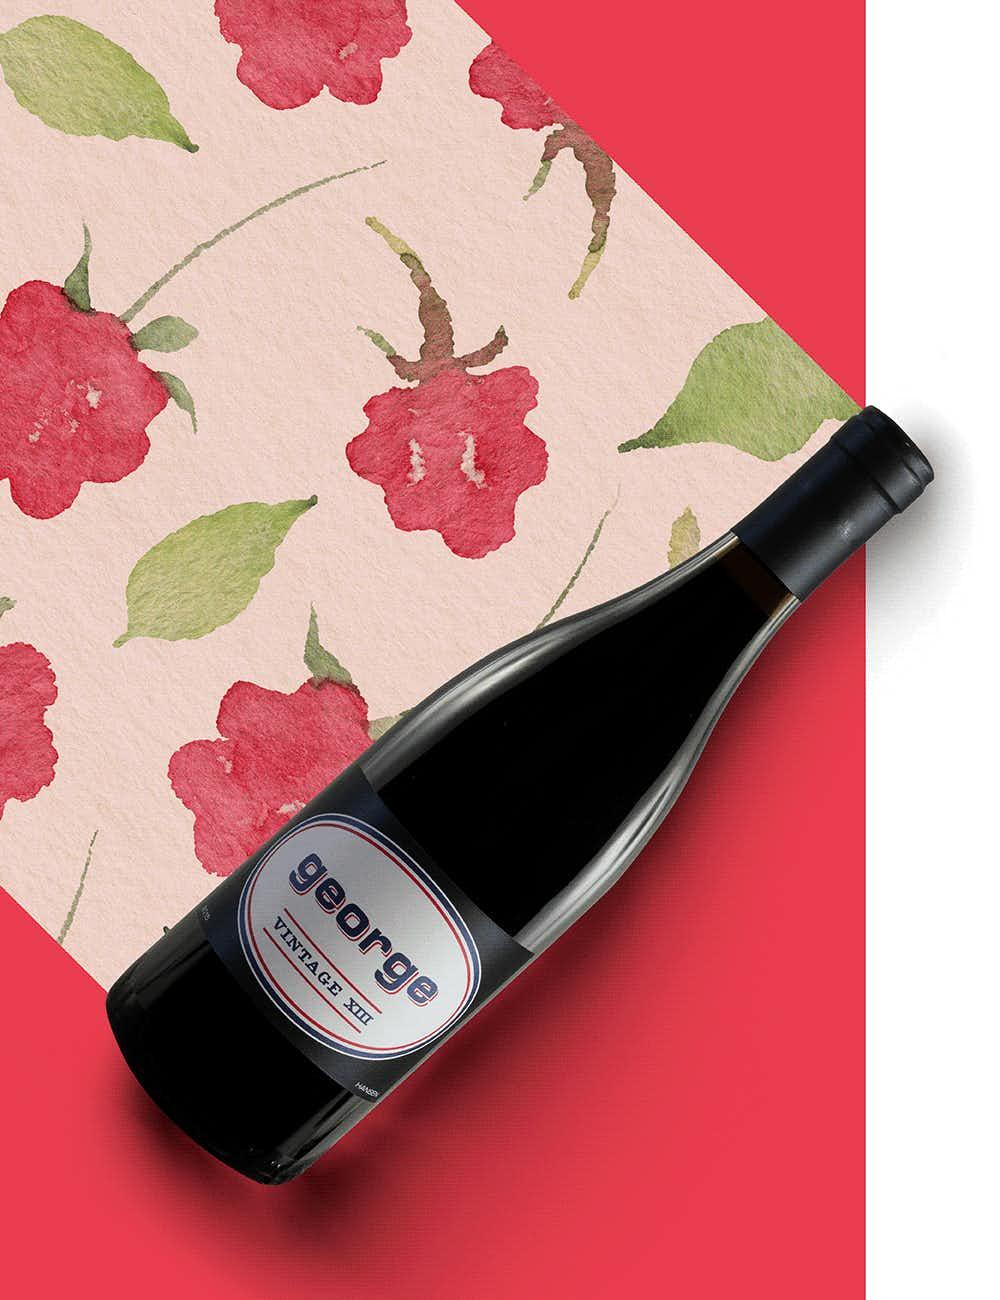 George Wine Company Hansen Vineyard Pinot Noir 2015